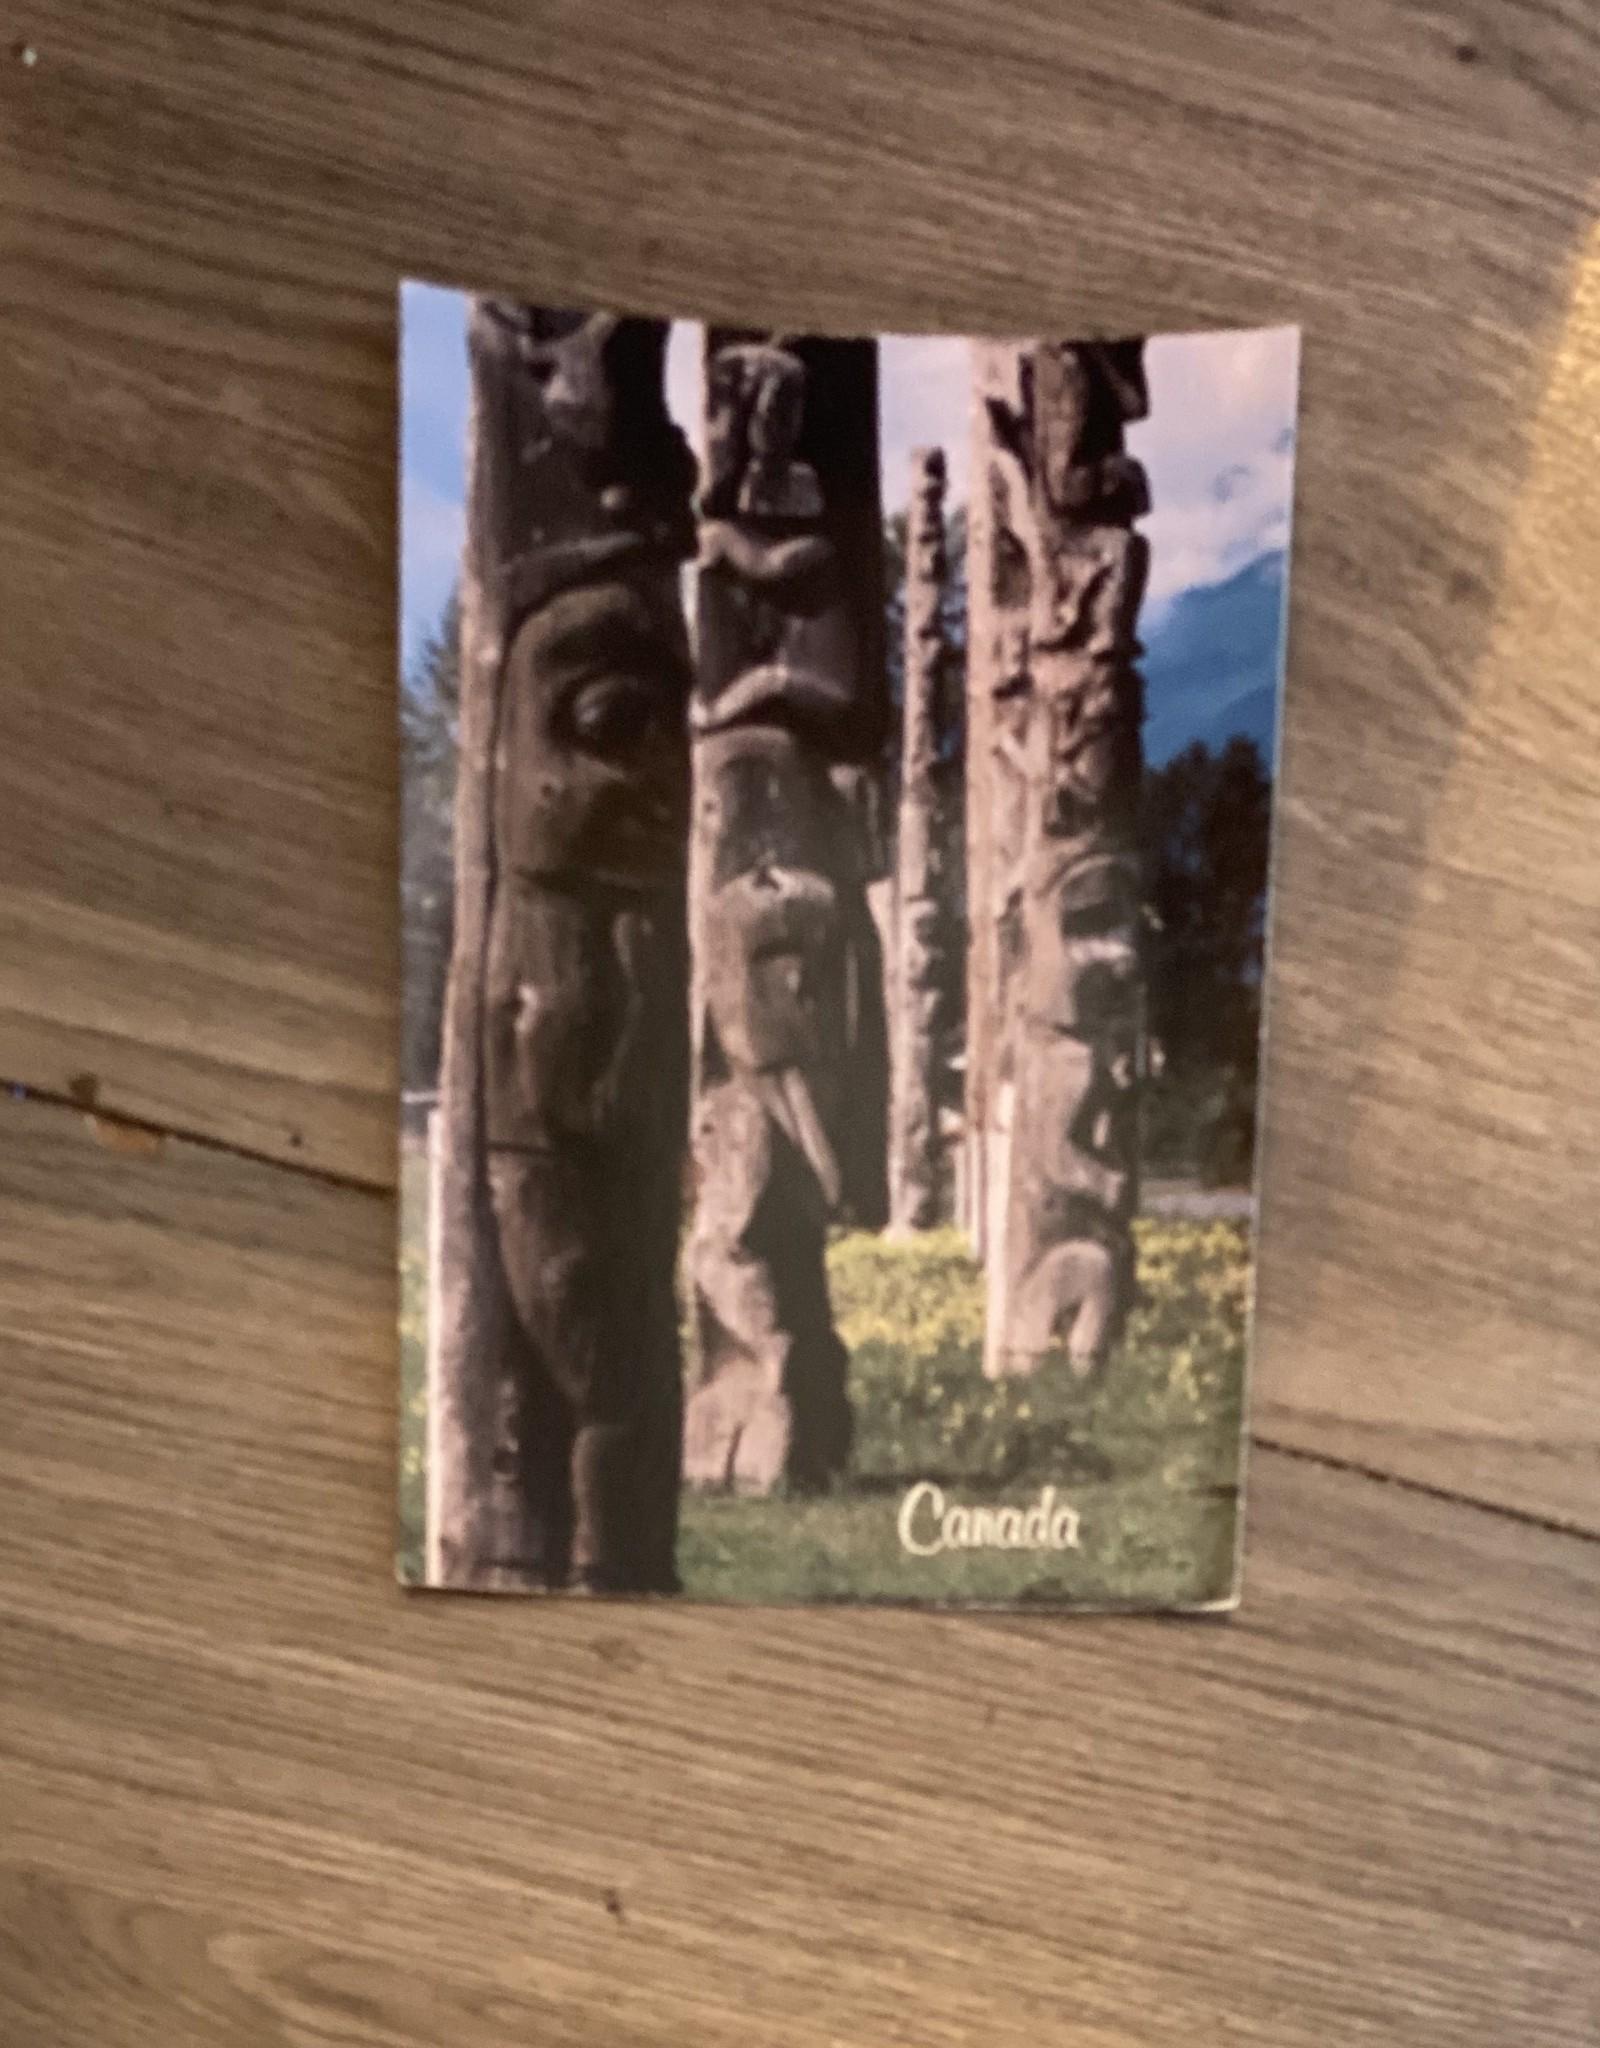 Purple Pigeon Treasures Post Card - Totem Poles